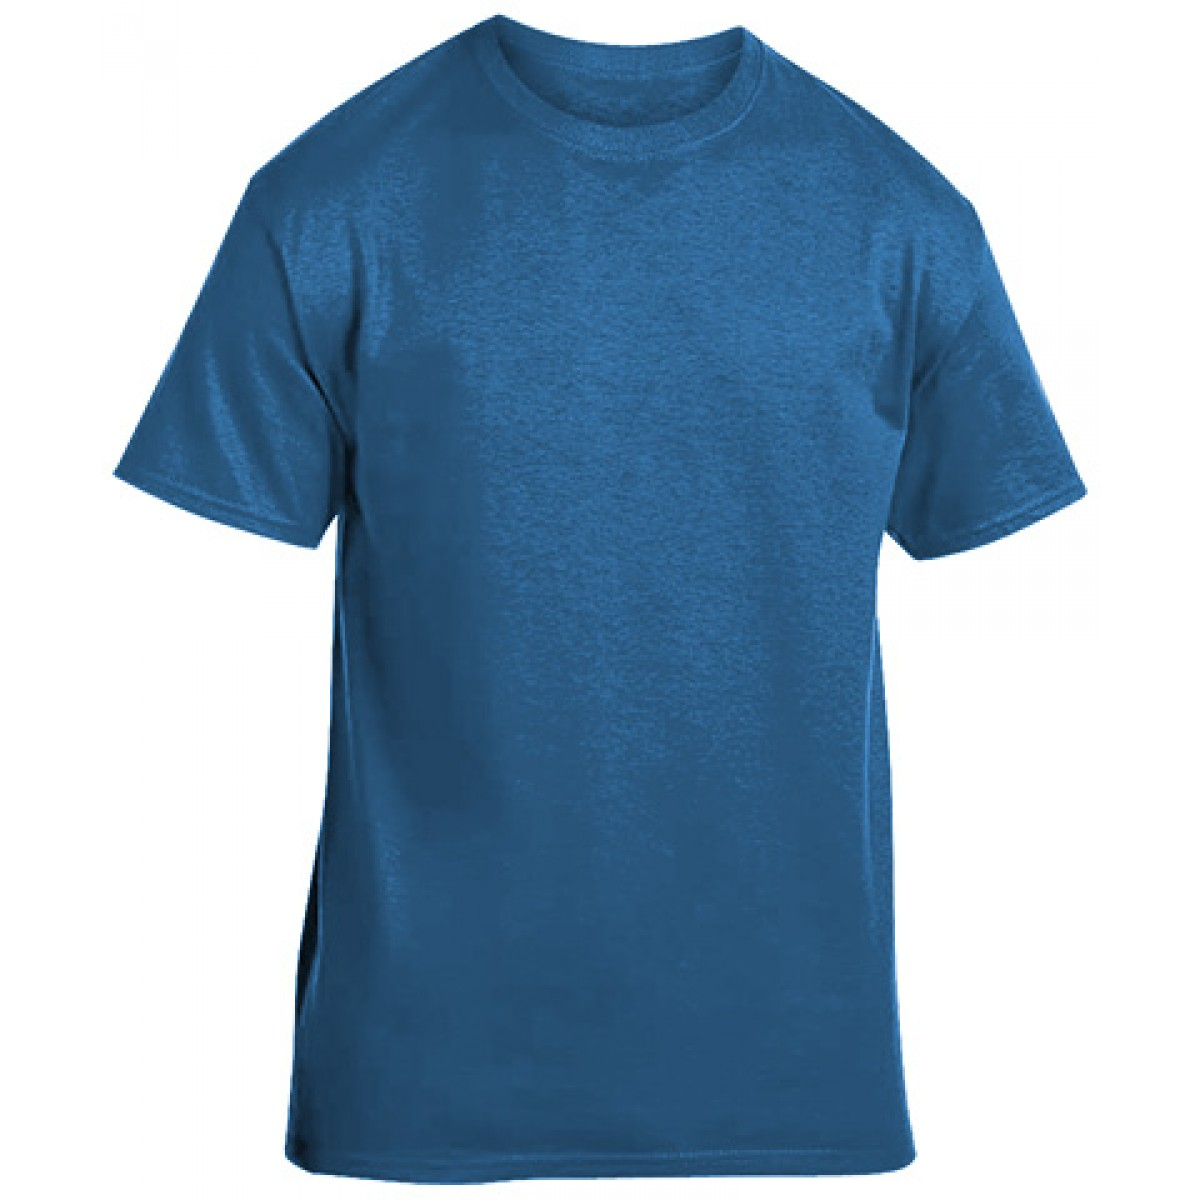 Soft 100% Cotton T-Shirt-Sapphire-S